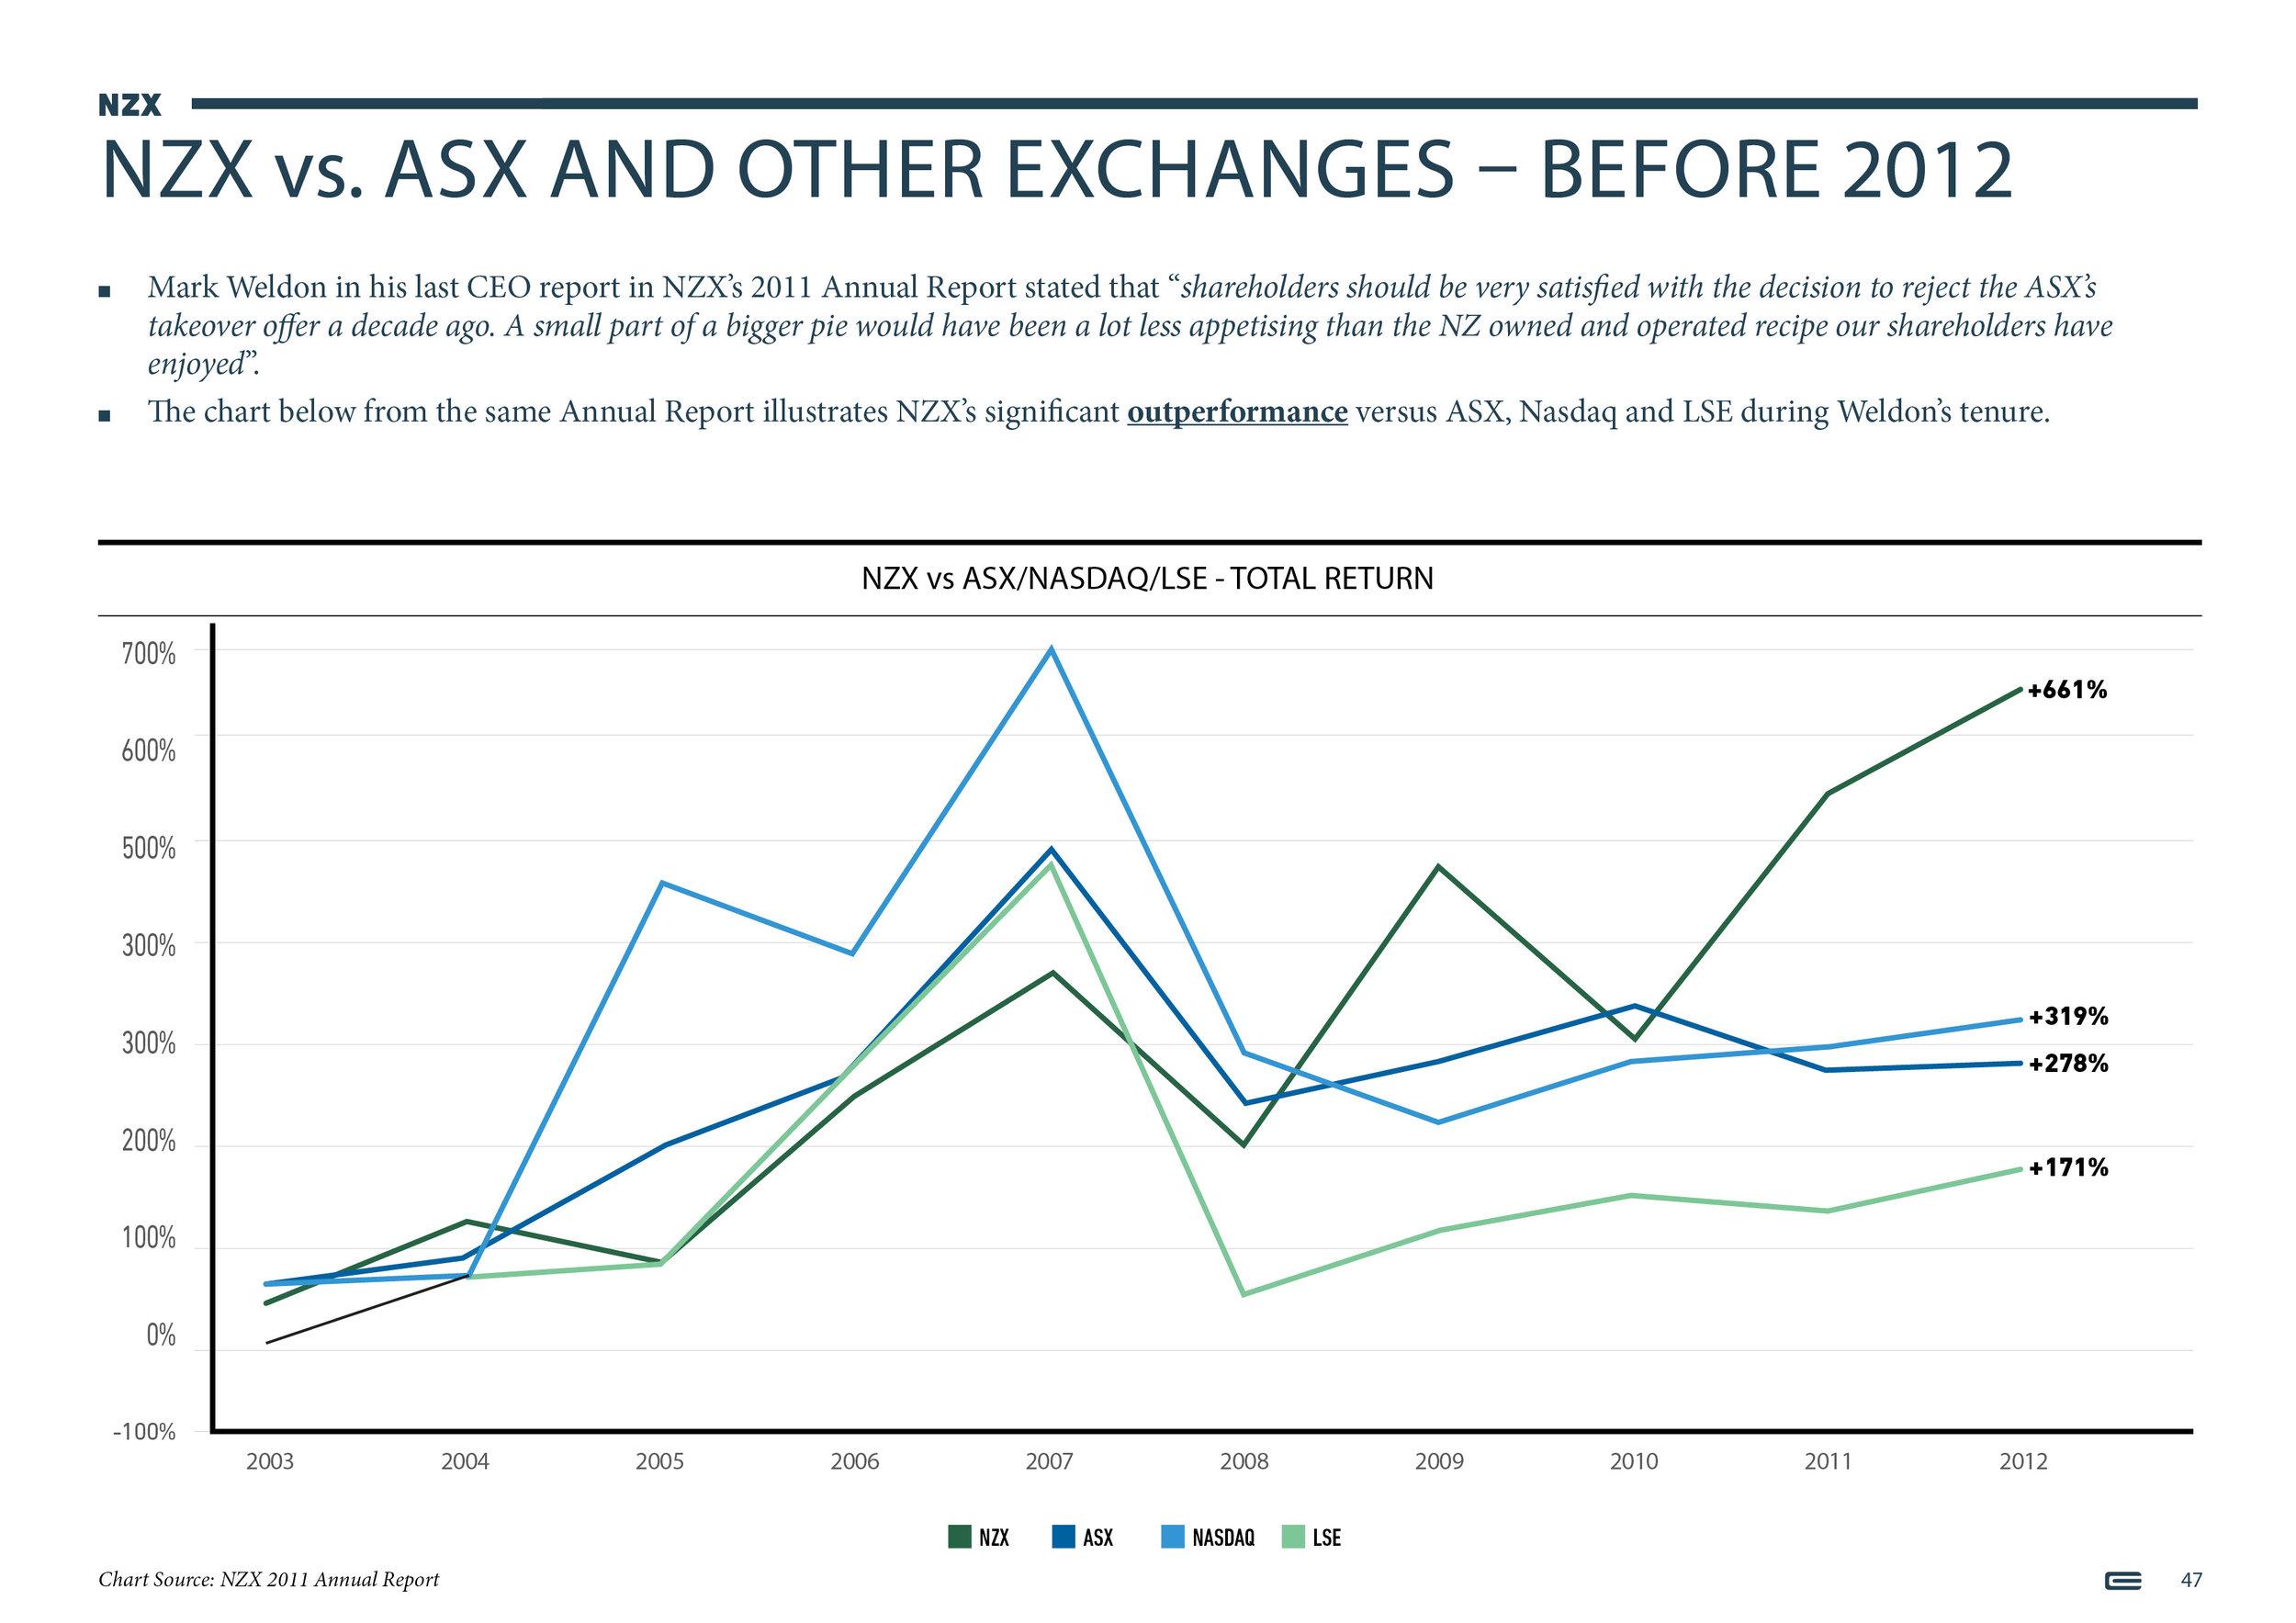 NZX Limited - Presentation - September 201847.jpg